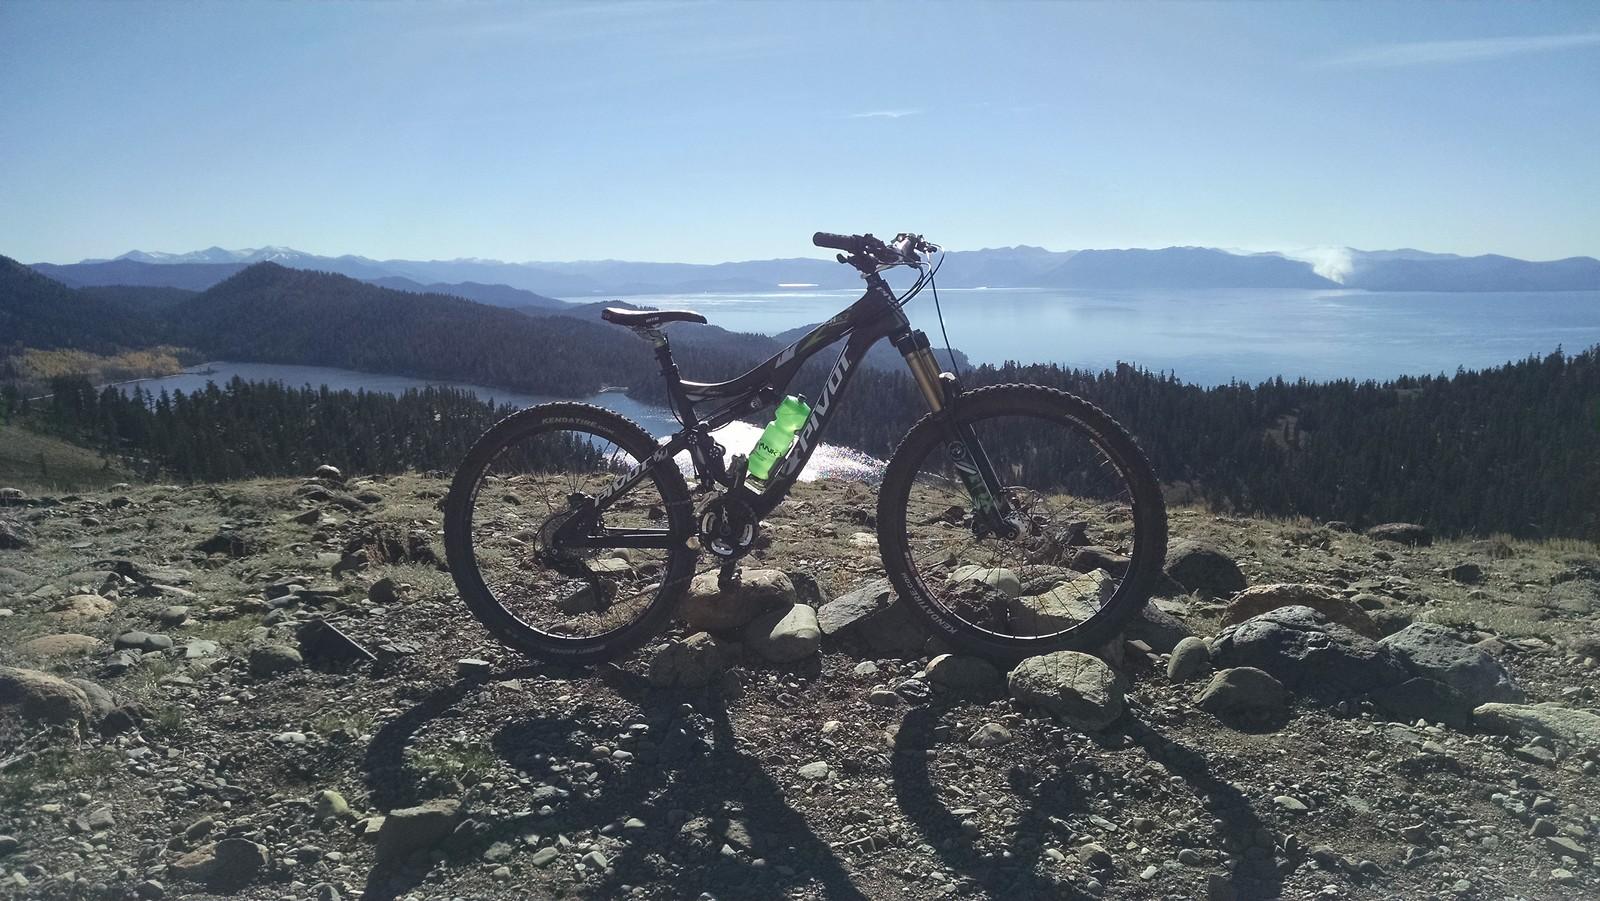 Lake Tahoe with Marlette Lake